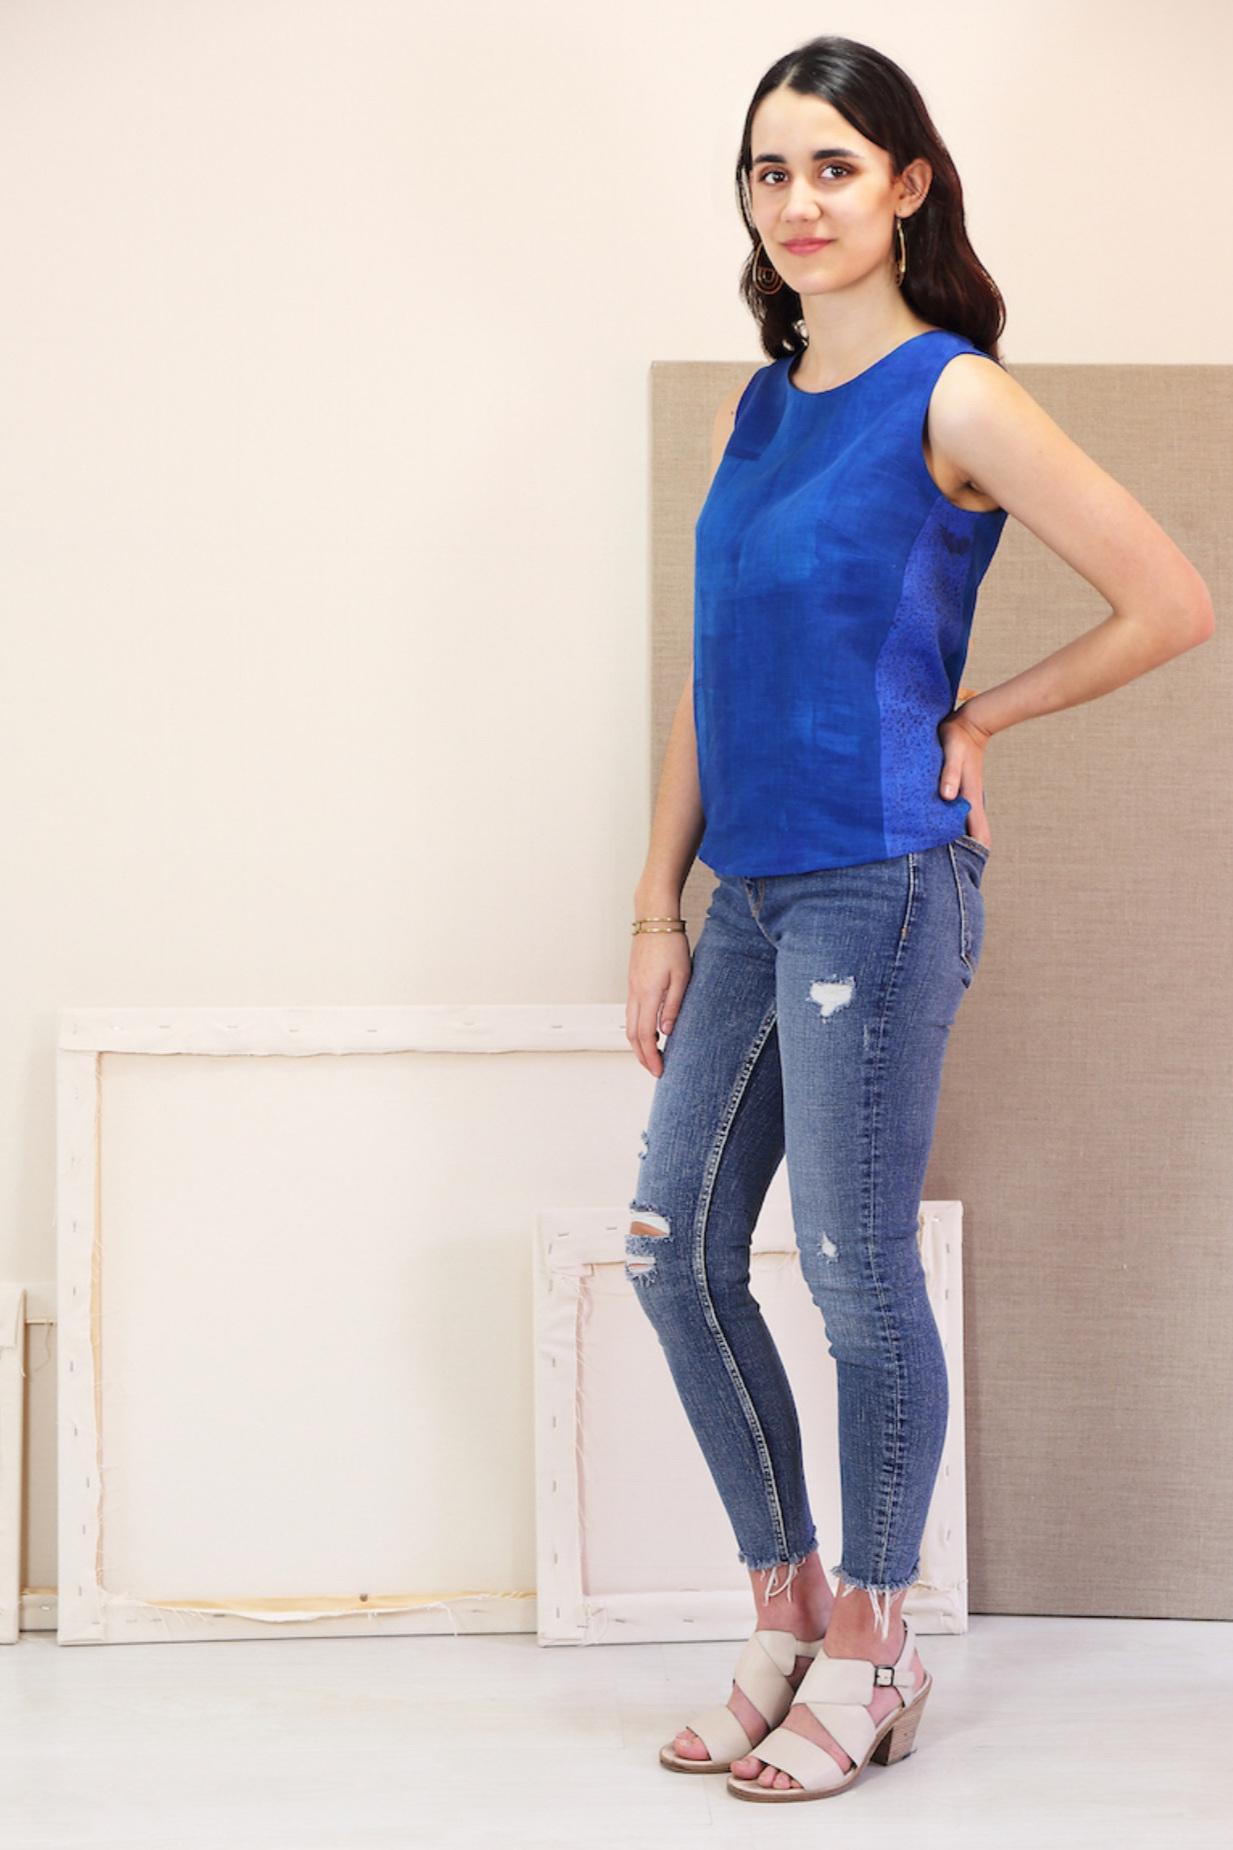 Breezy Blouse sewing pattern from Liesl + Co